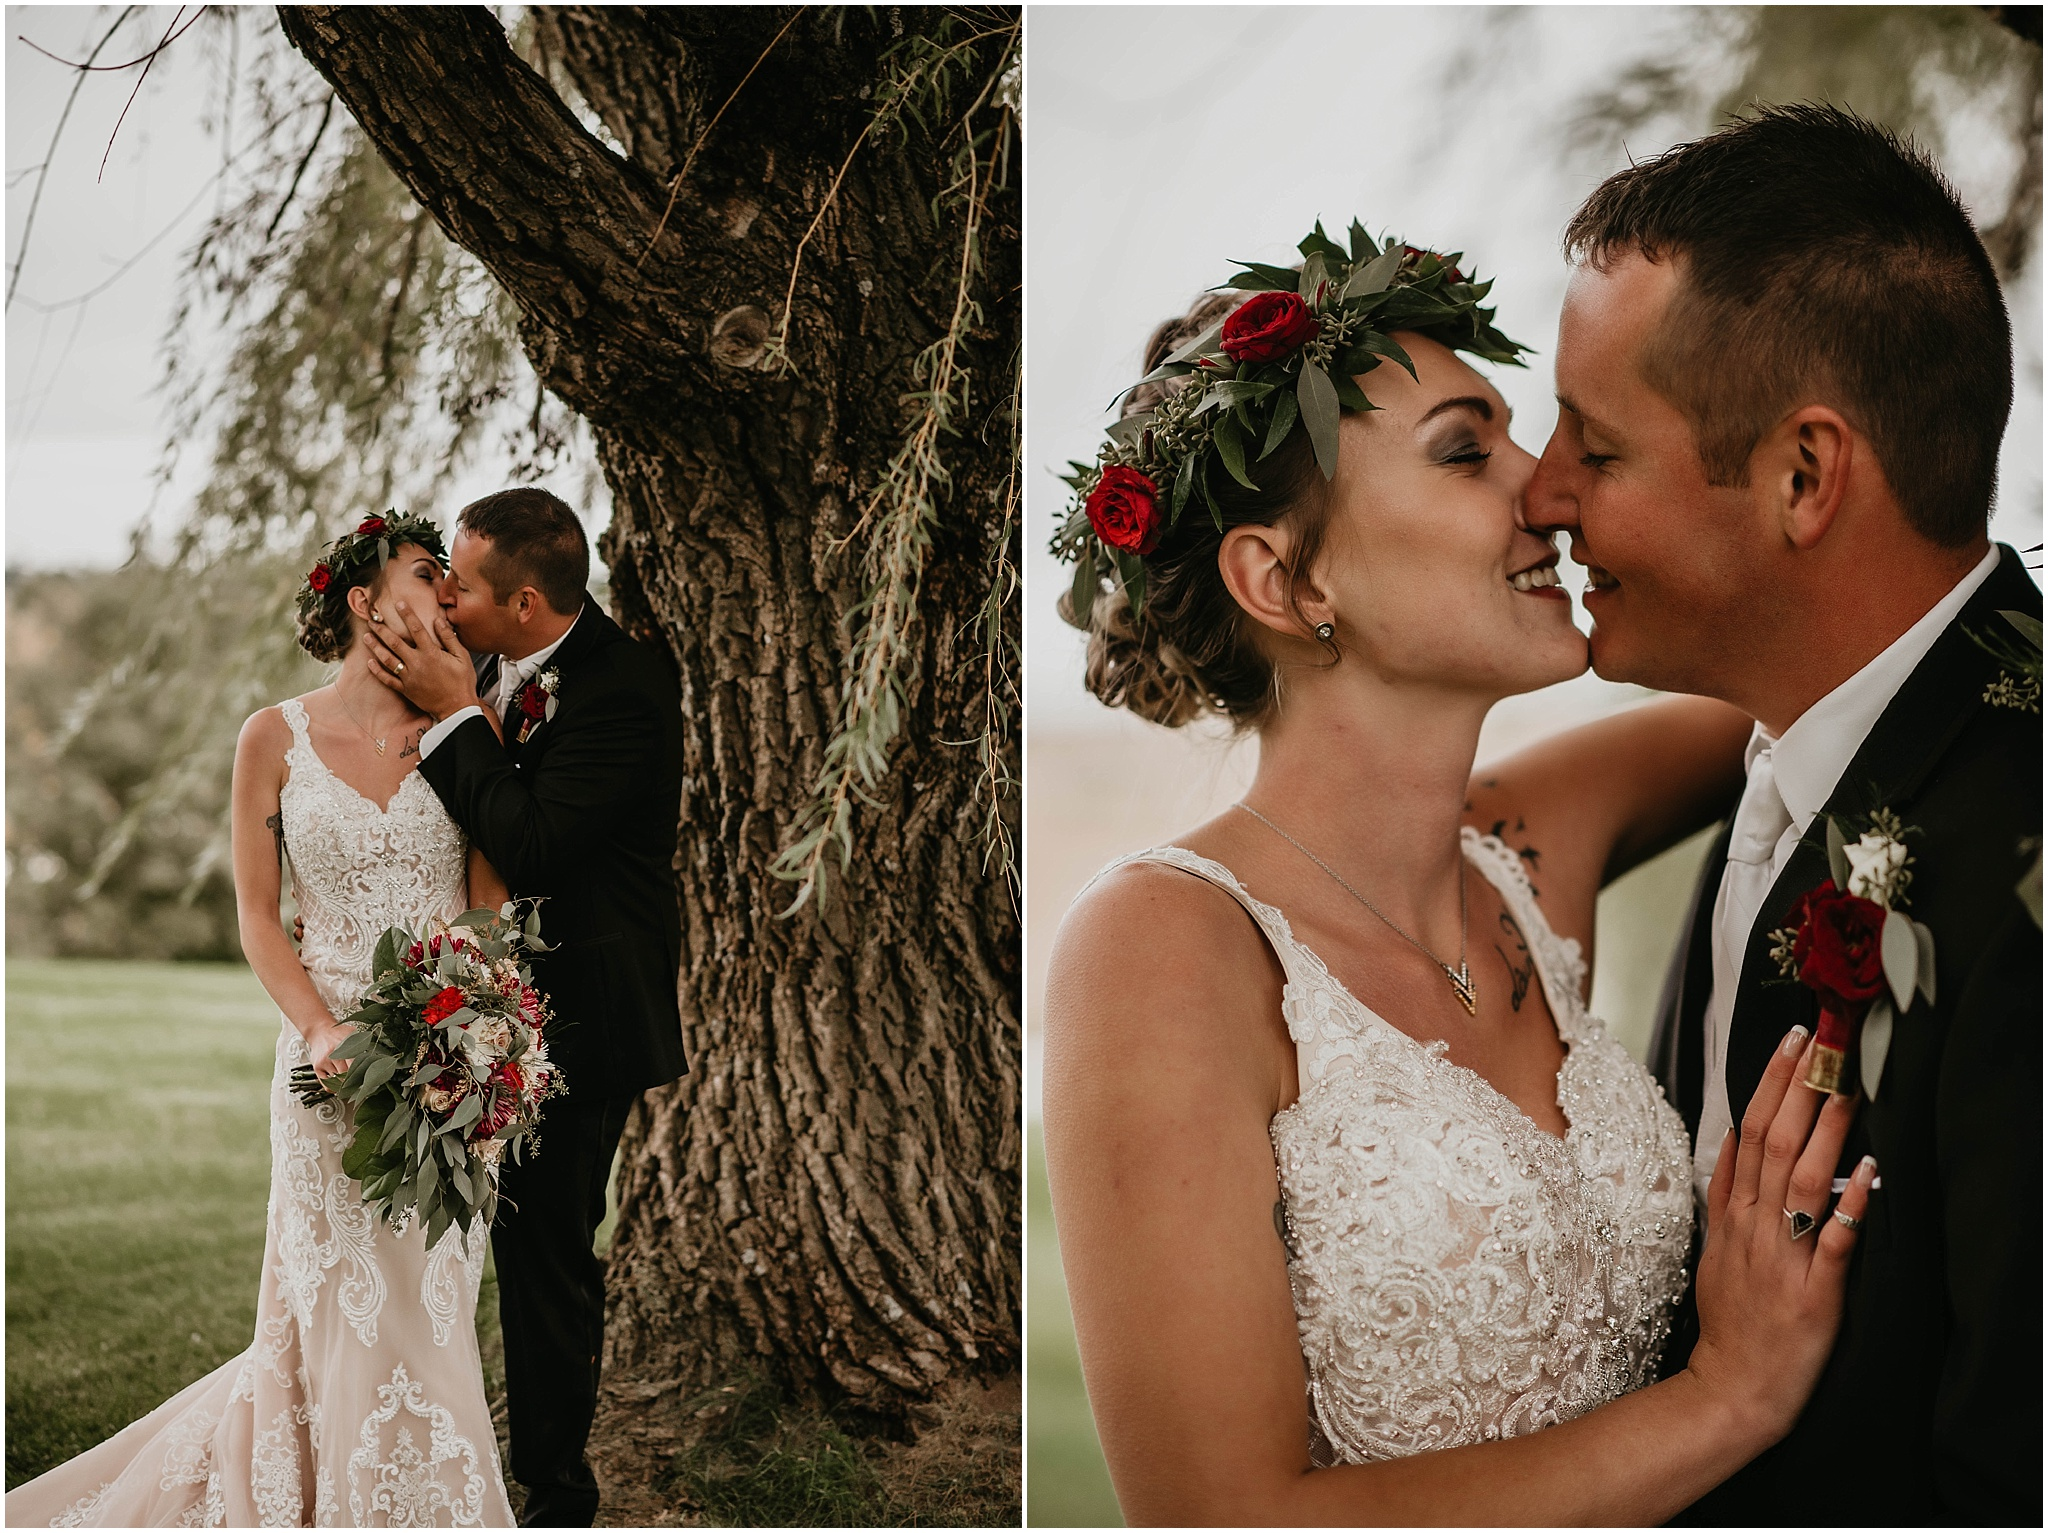 DesMoines-Iowa-Wedding-Photography-Destination-Photographer_0150.jpg